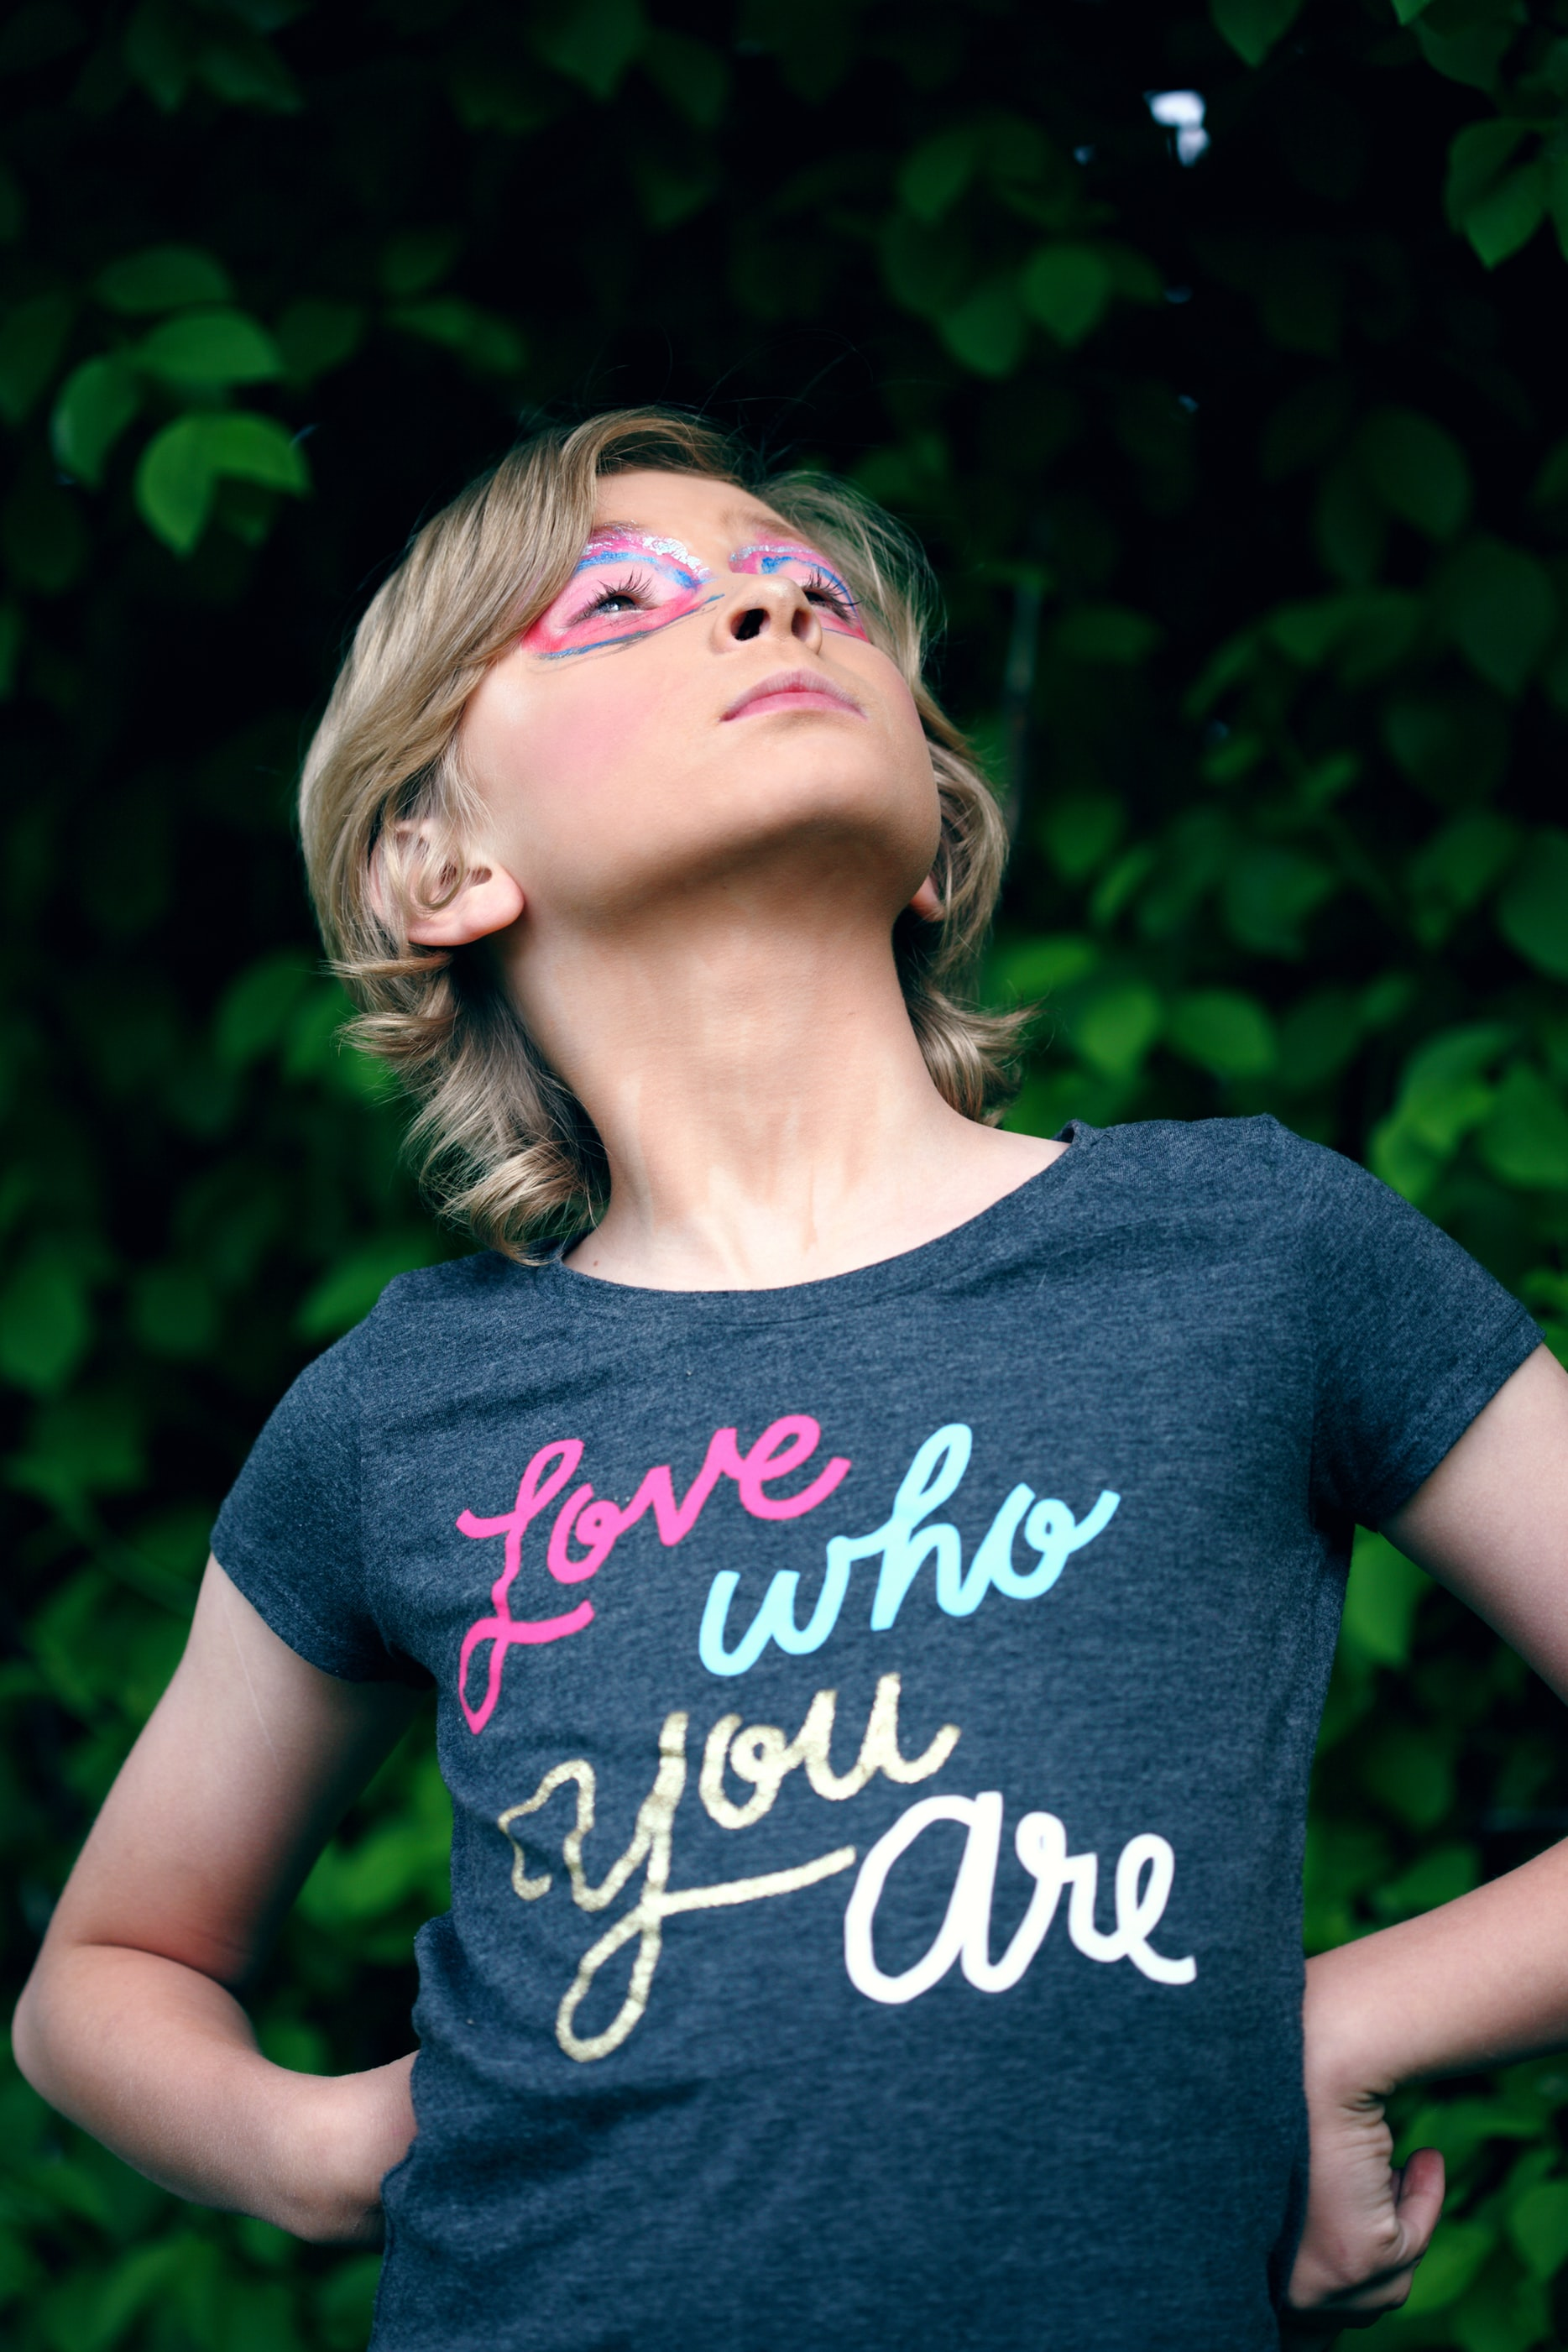 Unsplash Sharon McCutheon Self love photo-1556631082-6e7e496bd7dd.jpg